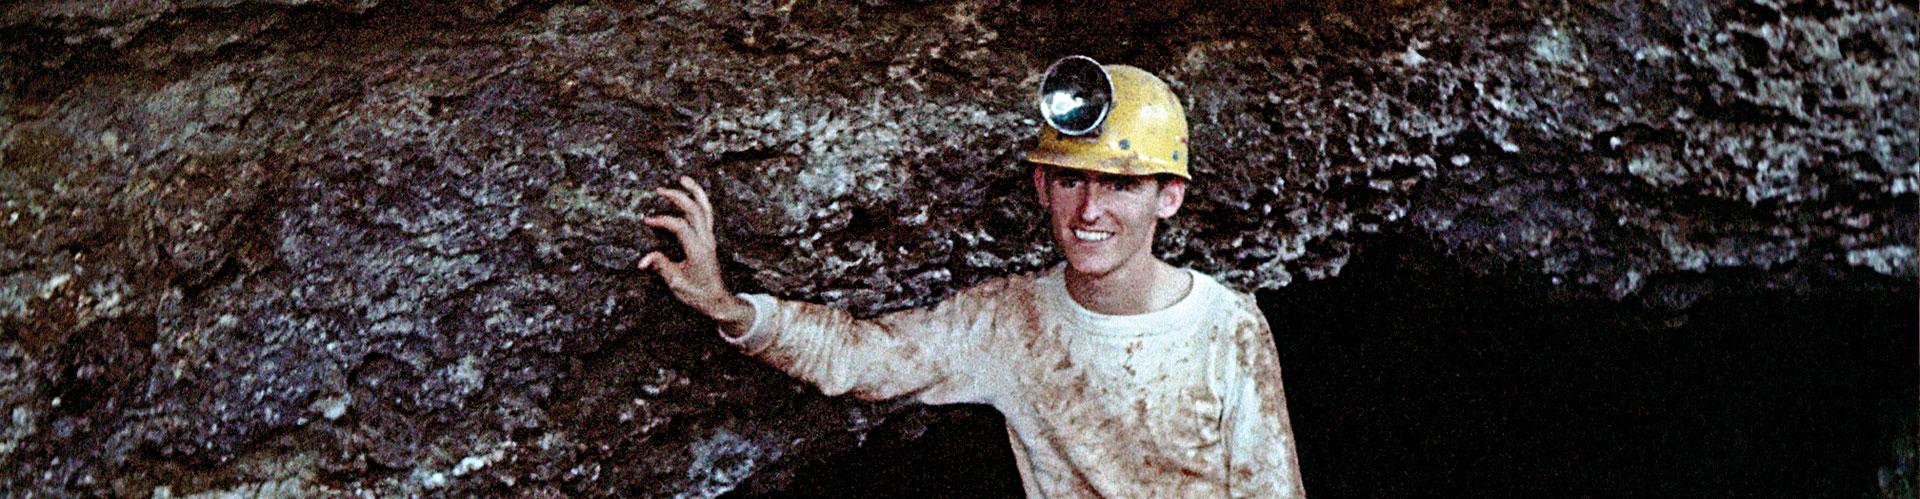 Original Caverns Explorers